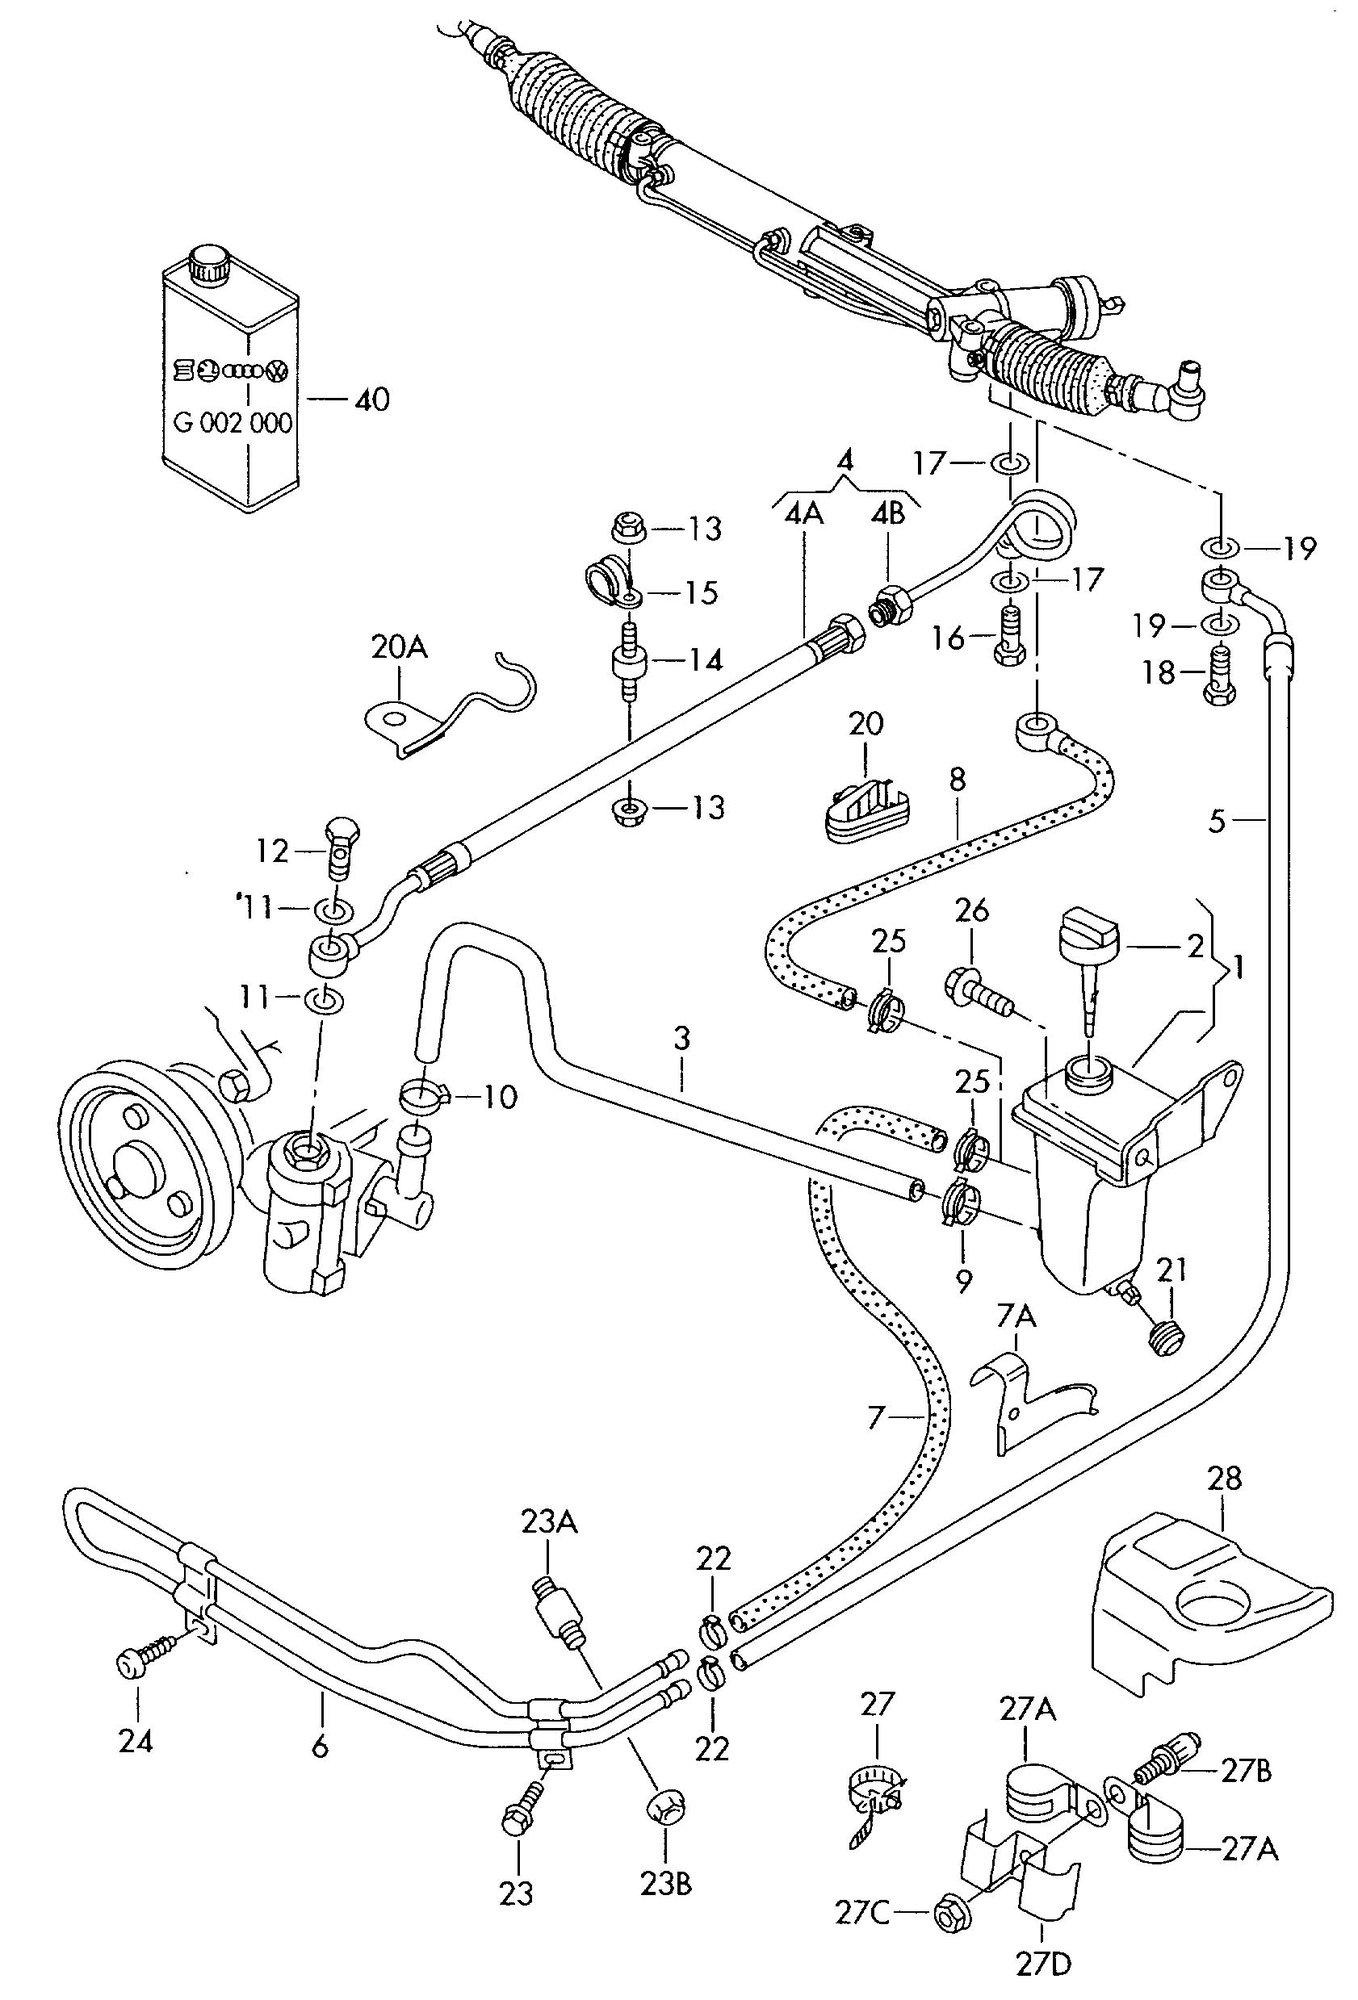 Oil Leak Under Engine W Pics Help